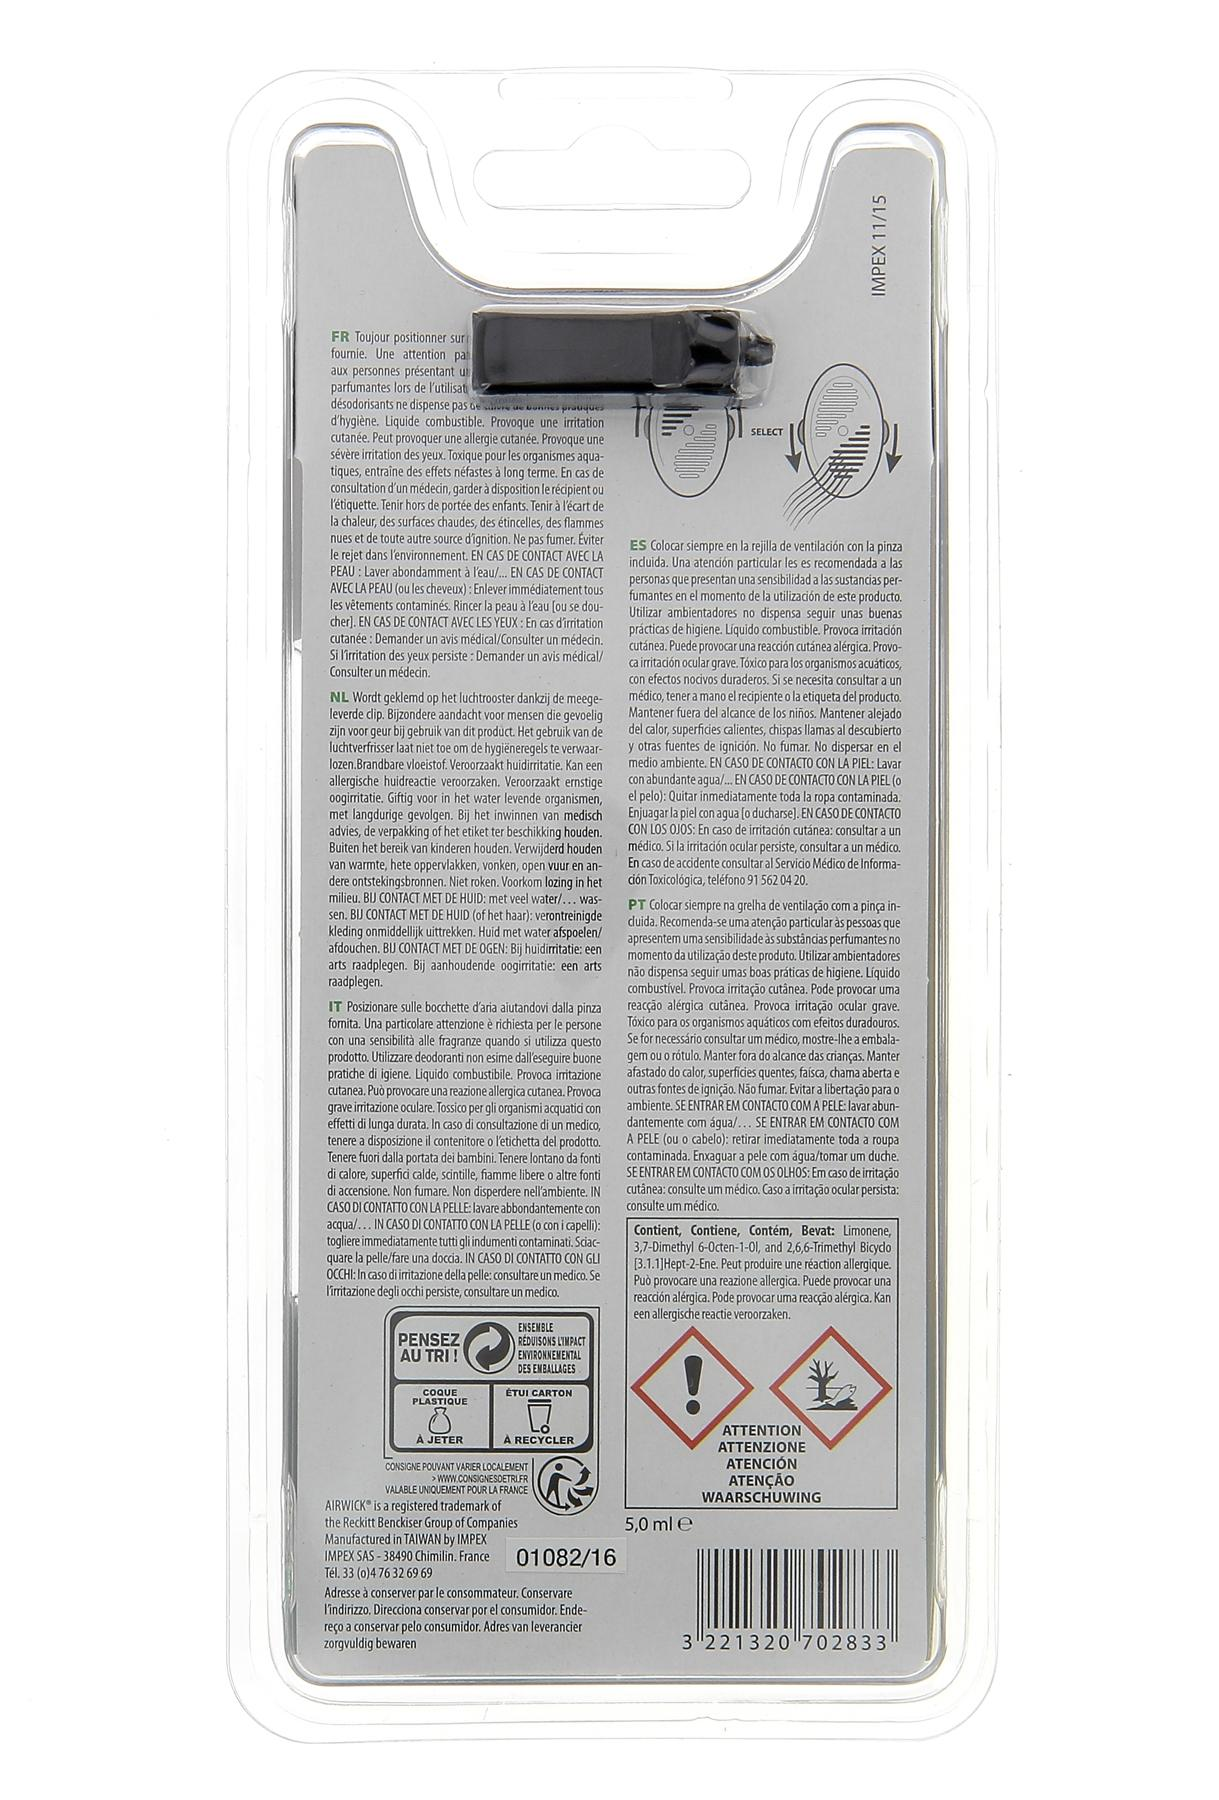 Lufterfrischer AIR WICK 070283 Bewertung